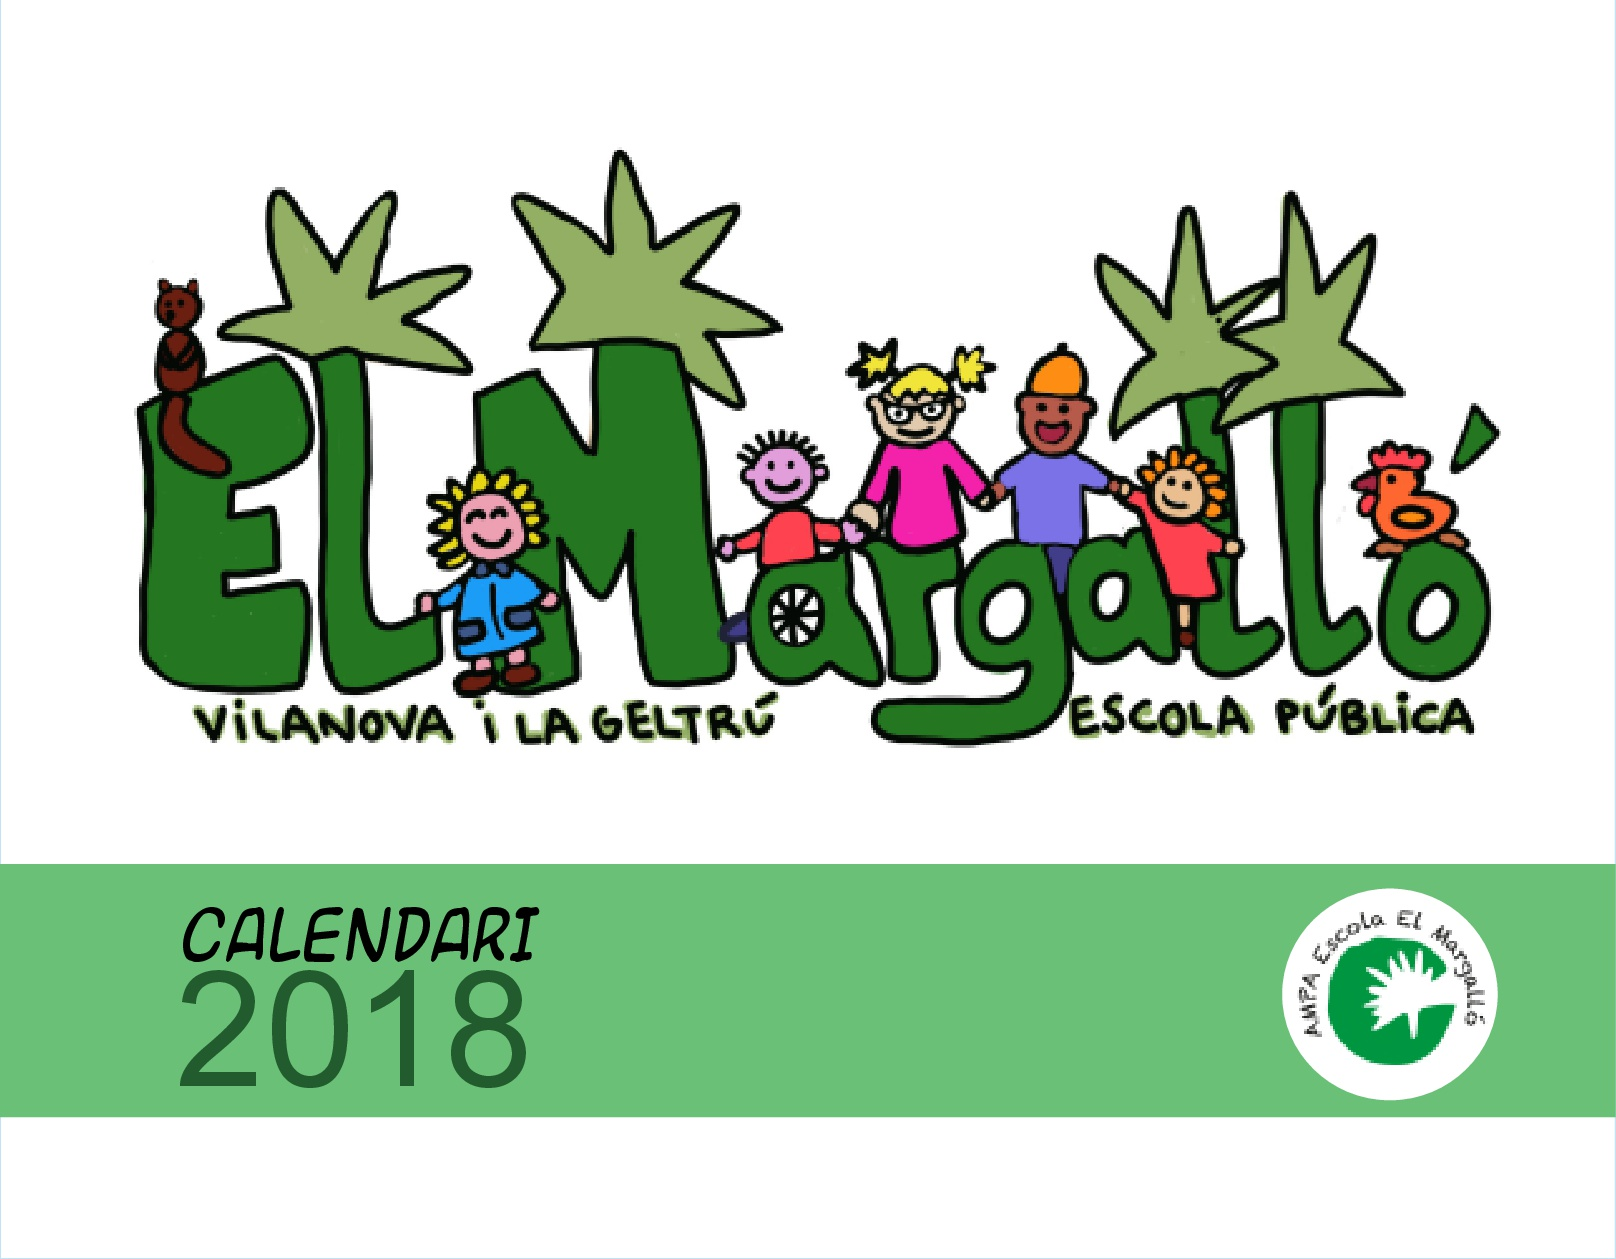 portada calendari 2018